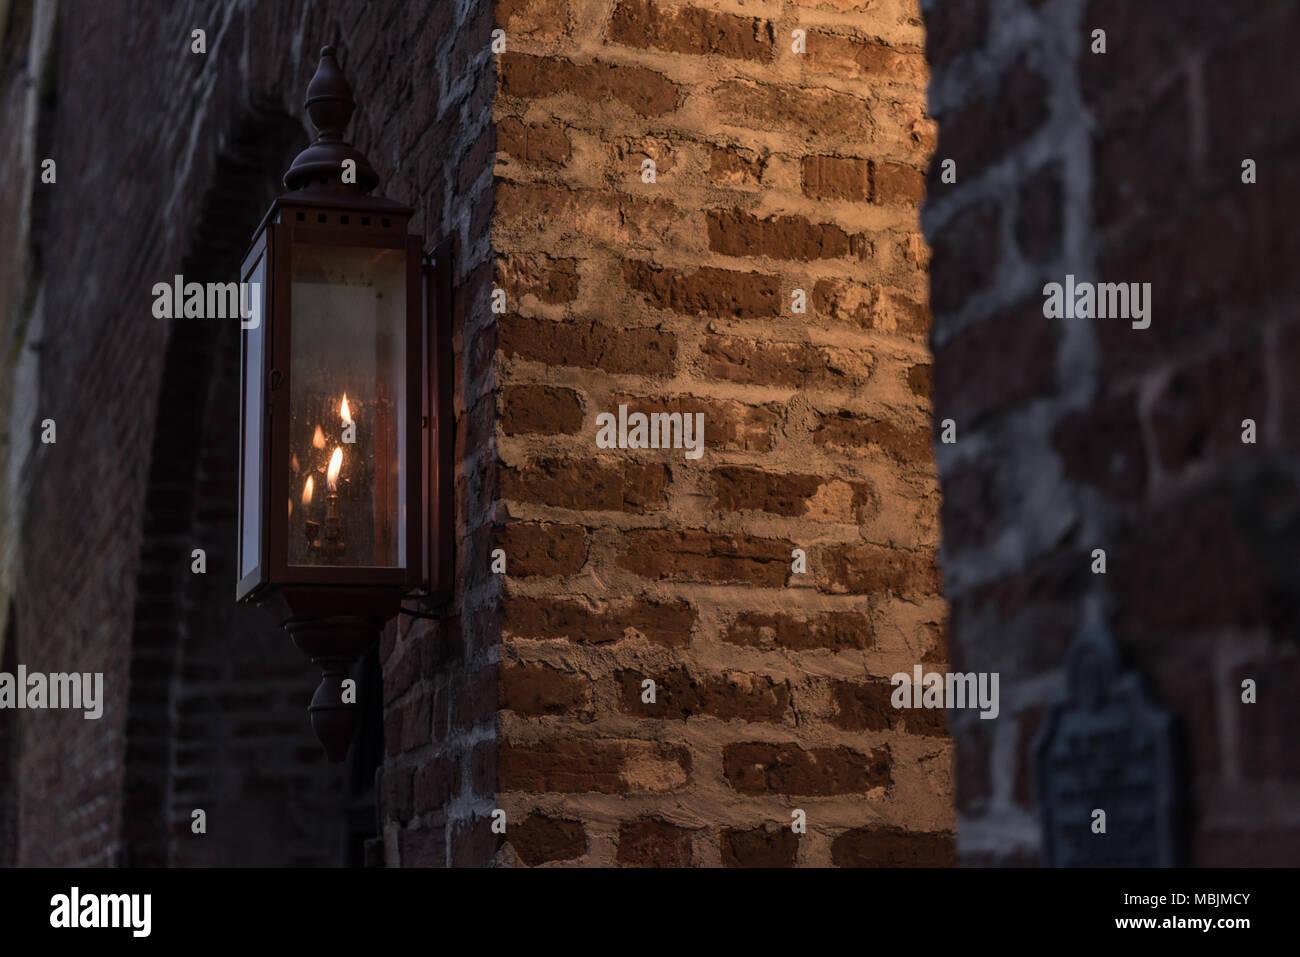 Gas Lamp Around the Corner of Lit Brick Wall - Stock Image